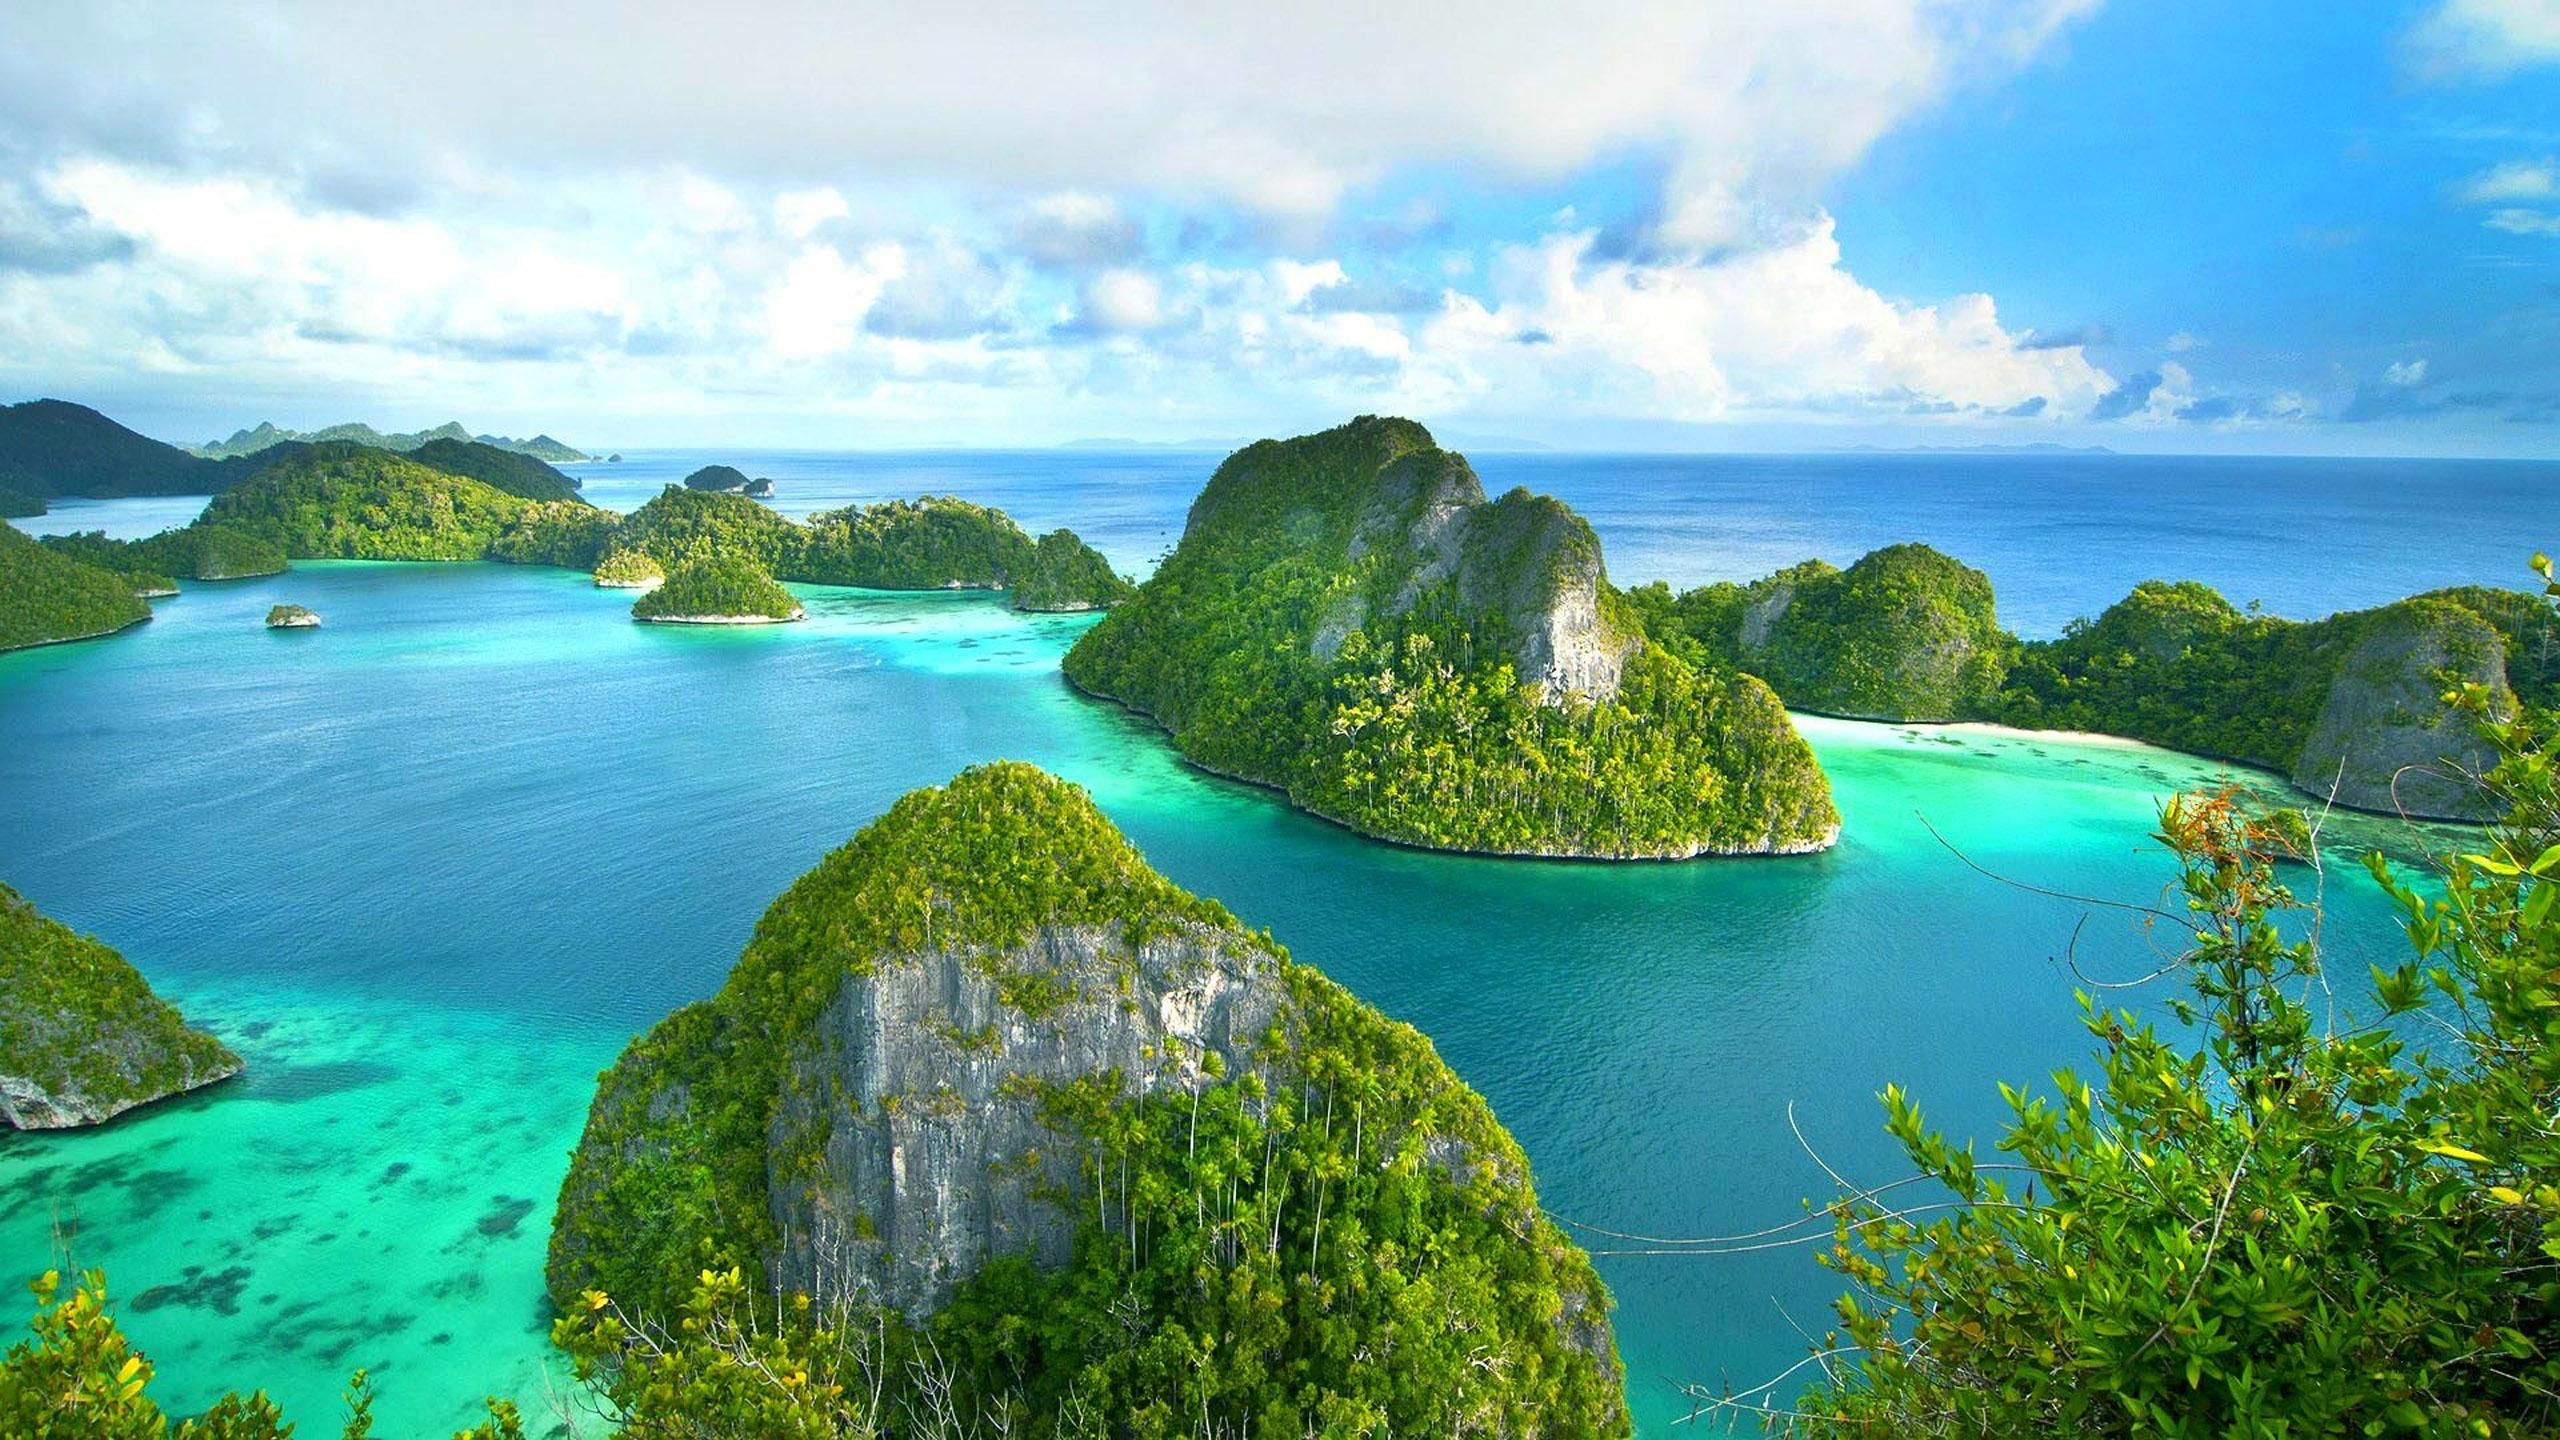 World Beautiful Cars Wallpapers Island Sea Ocean Wallpaper Background Raja Ampat West